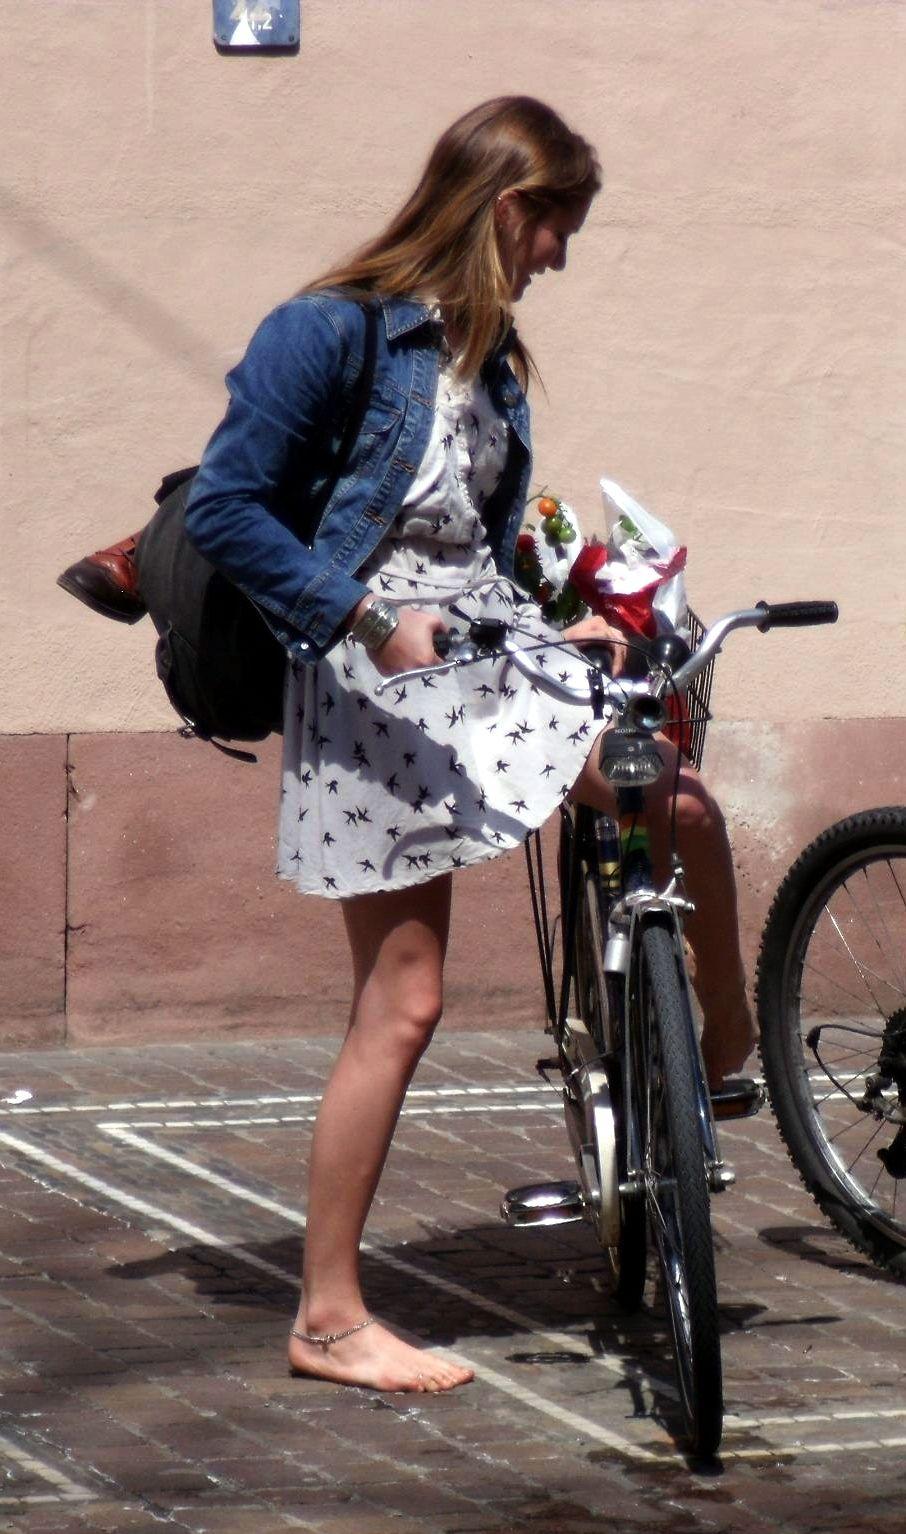 Barefoot Girl Bike